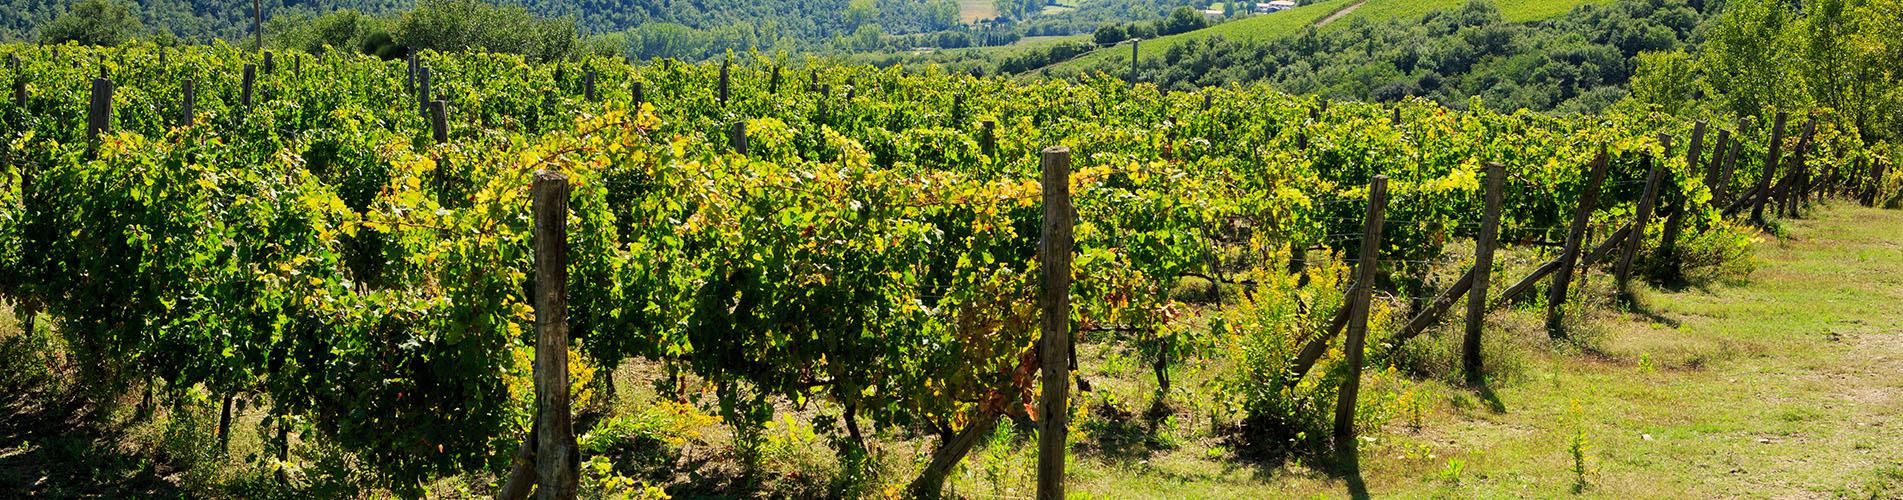 tuscany_slide1